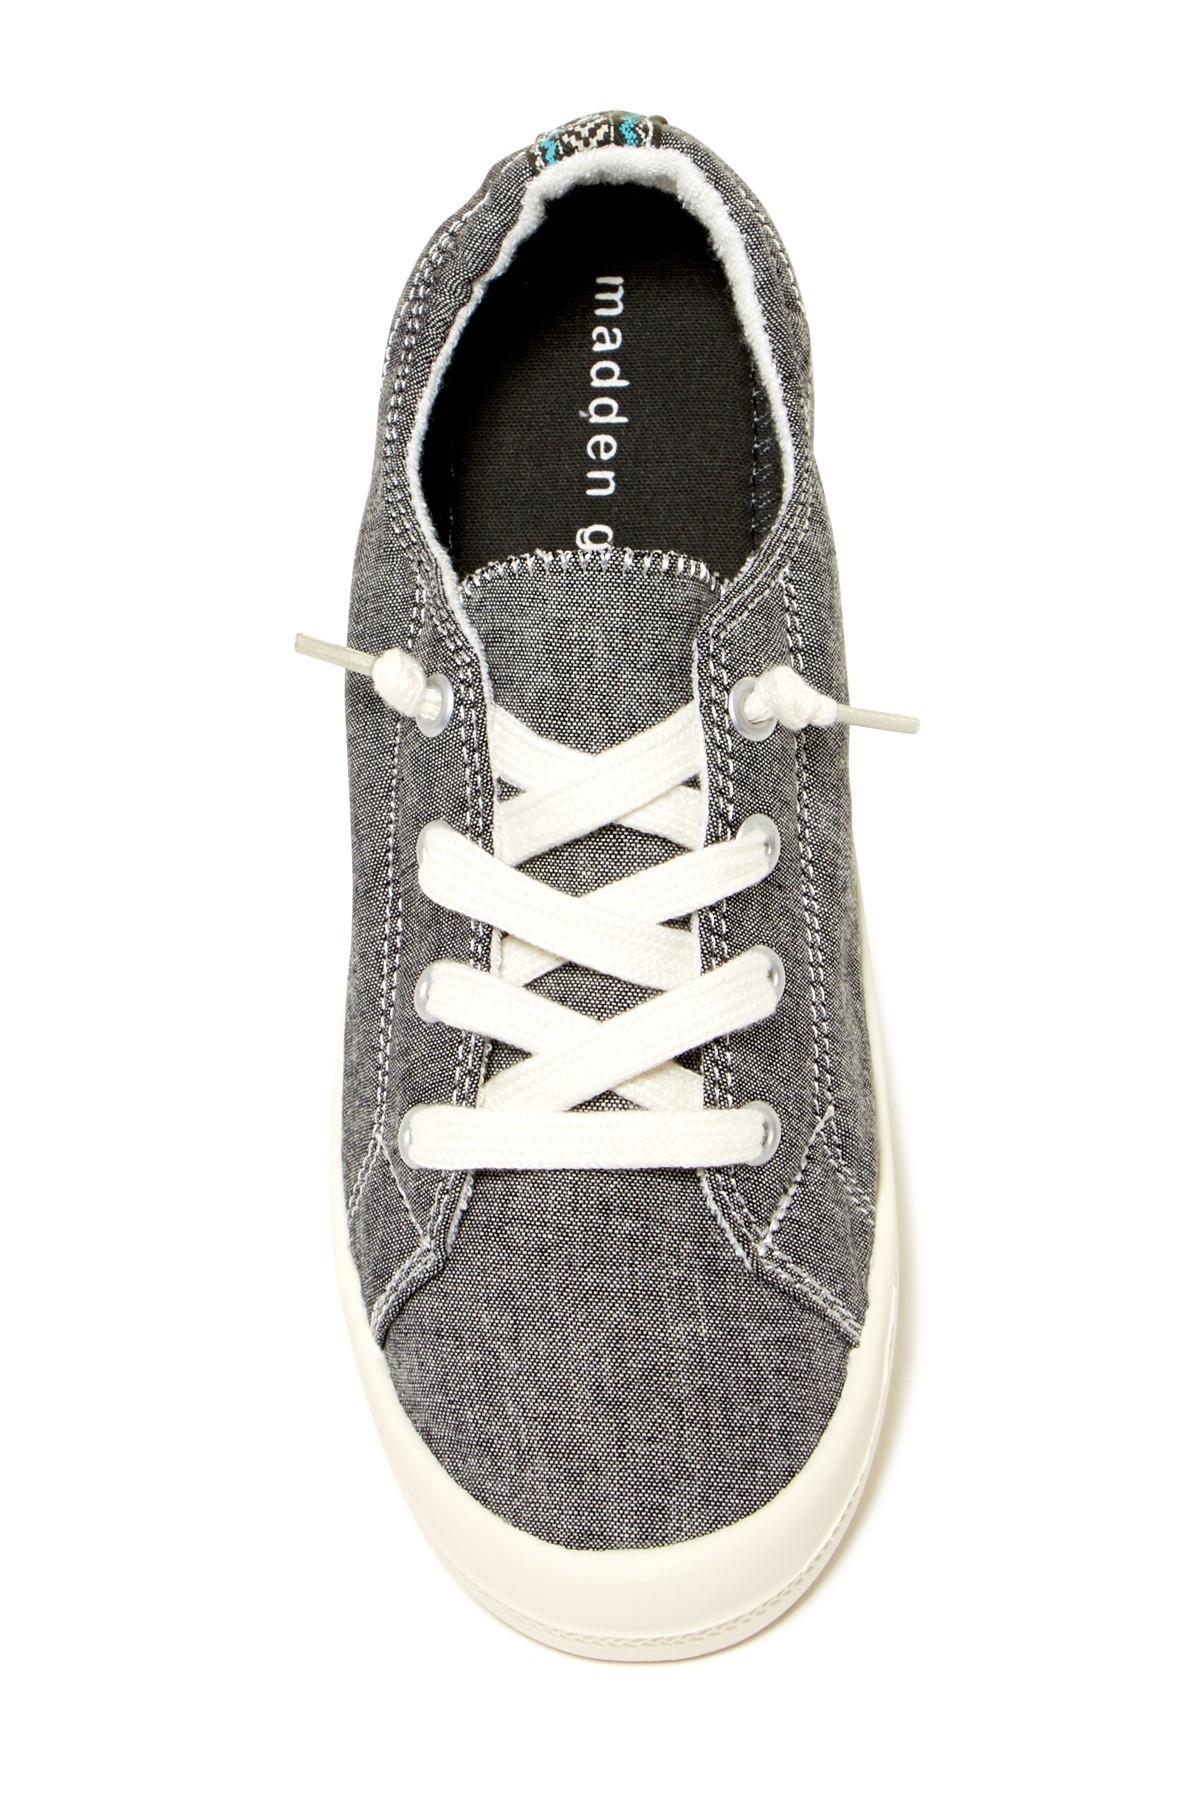 Madden Girl Barby Sneaker - Lyst